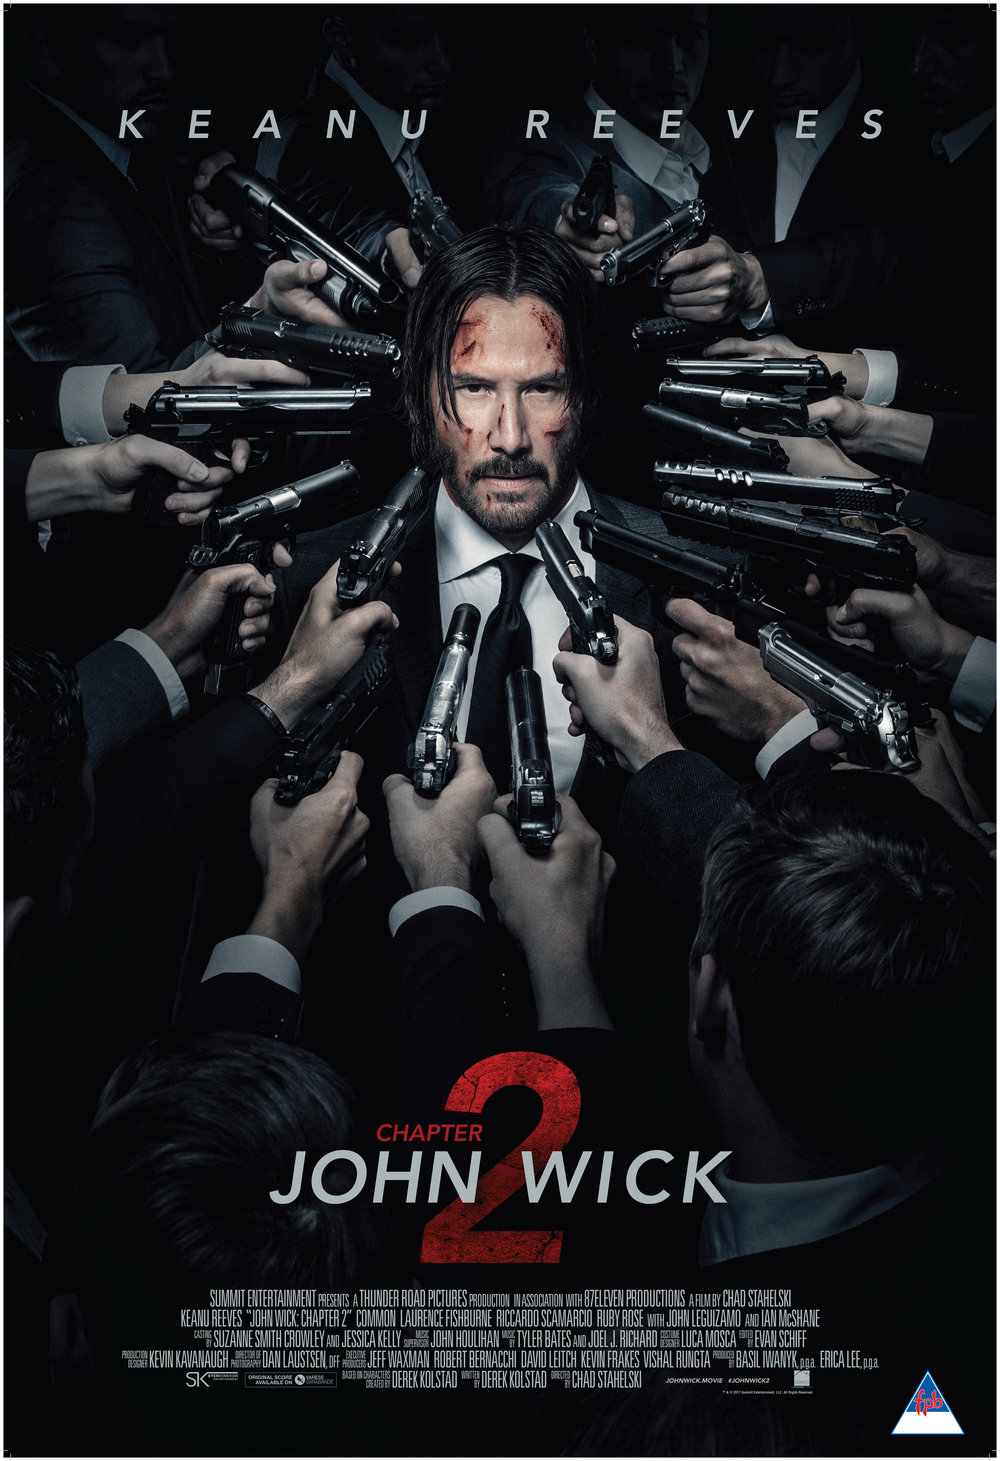 John Wick 2 Poster HR.jpg